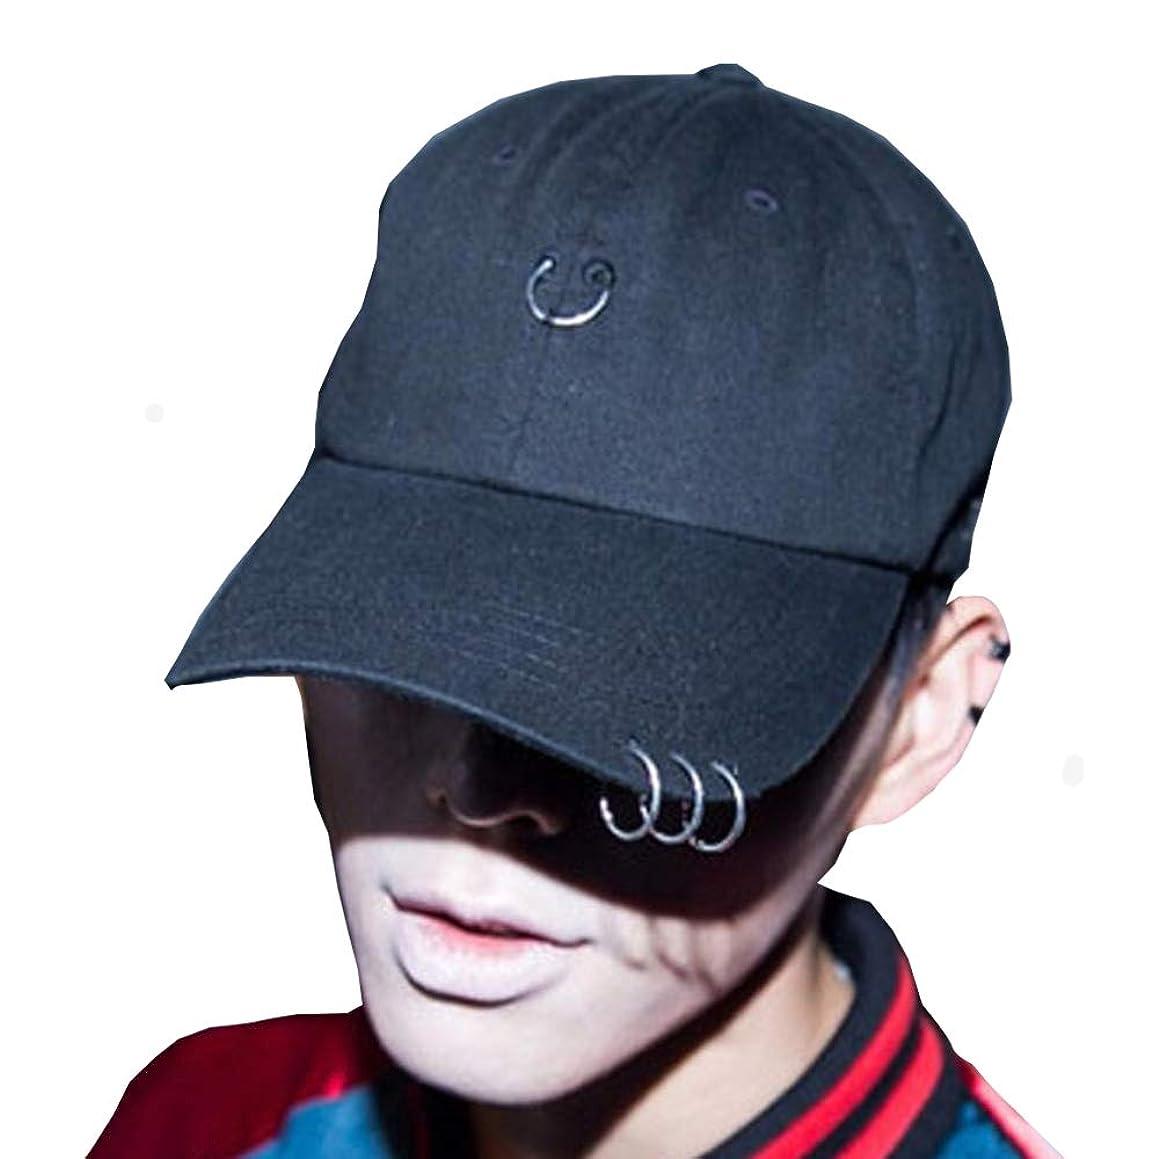 Hats for Men and Women, Hip hop, Hip hop, Full Match, Curve, Iron Hoop Cap Custom